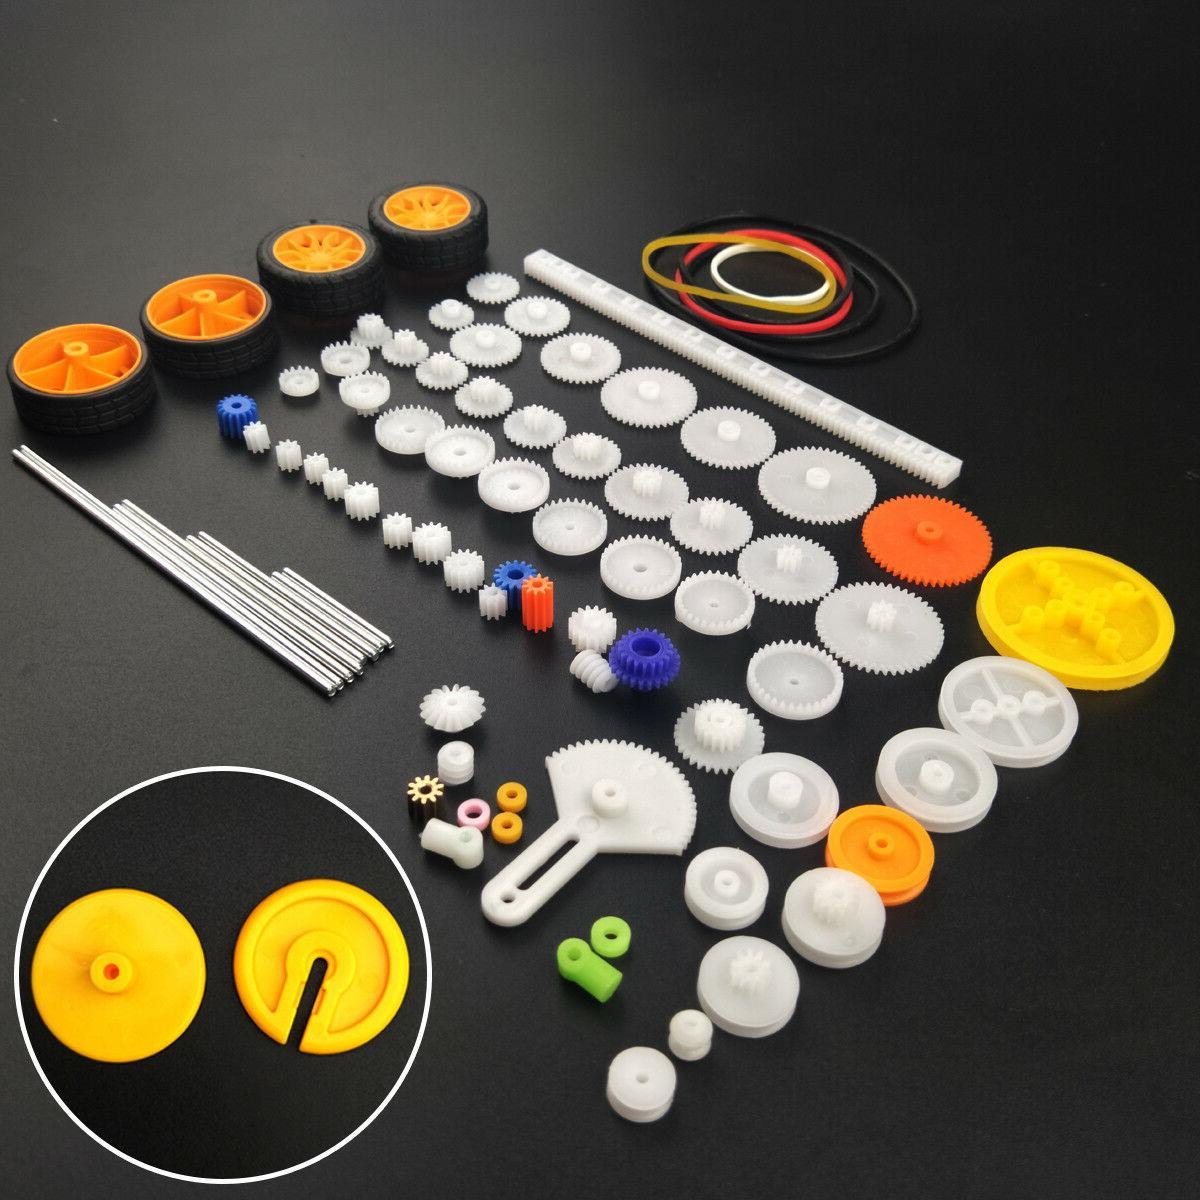 82 pcs plastic gear package kit diy